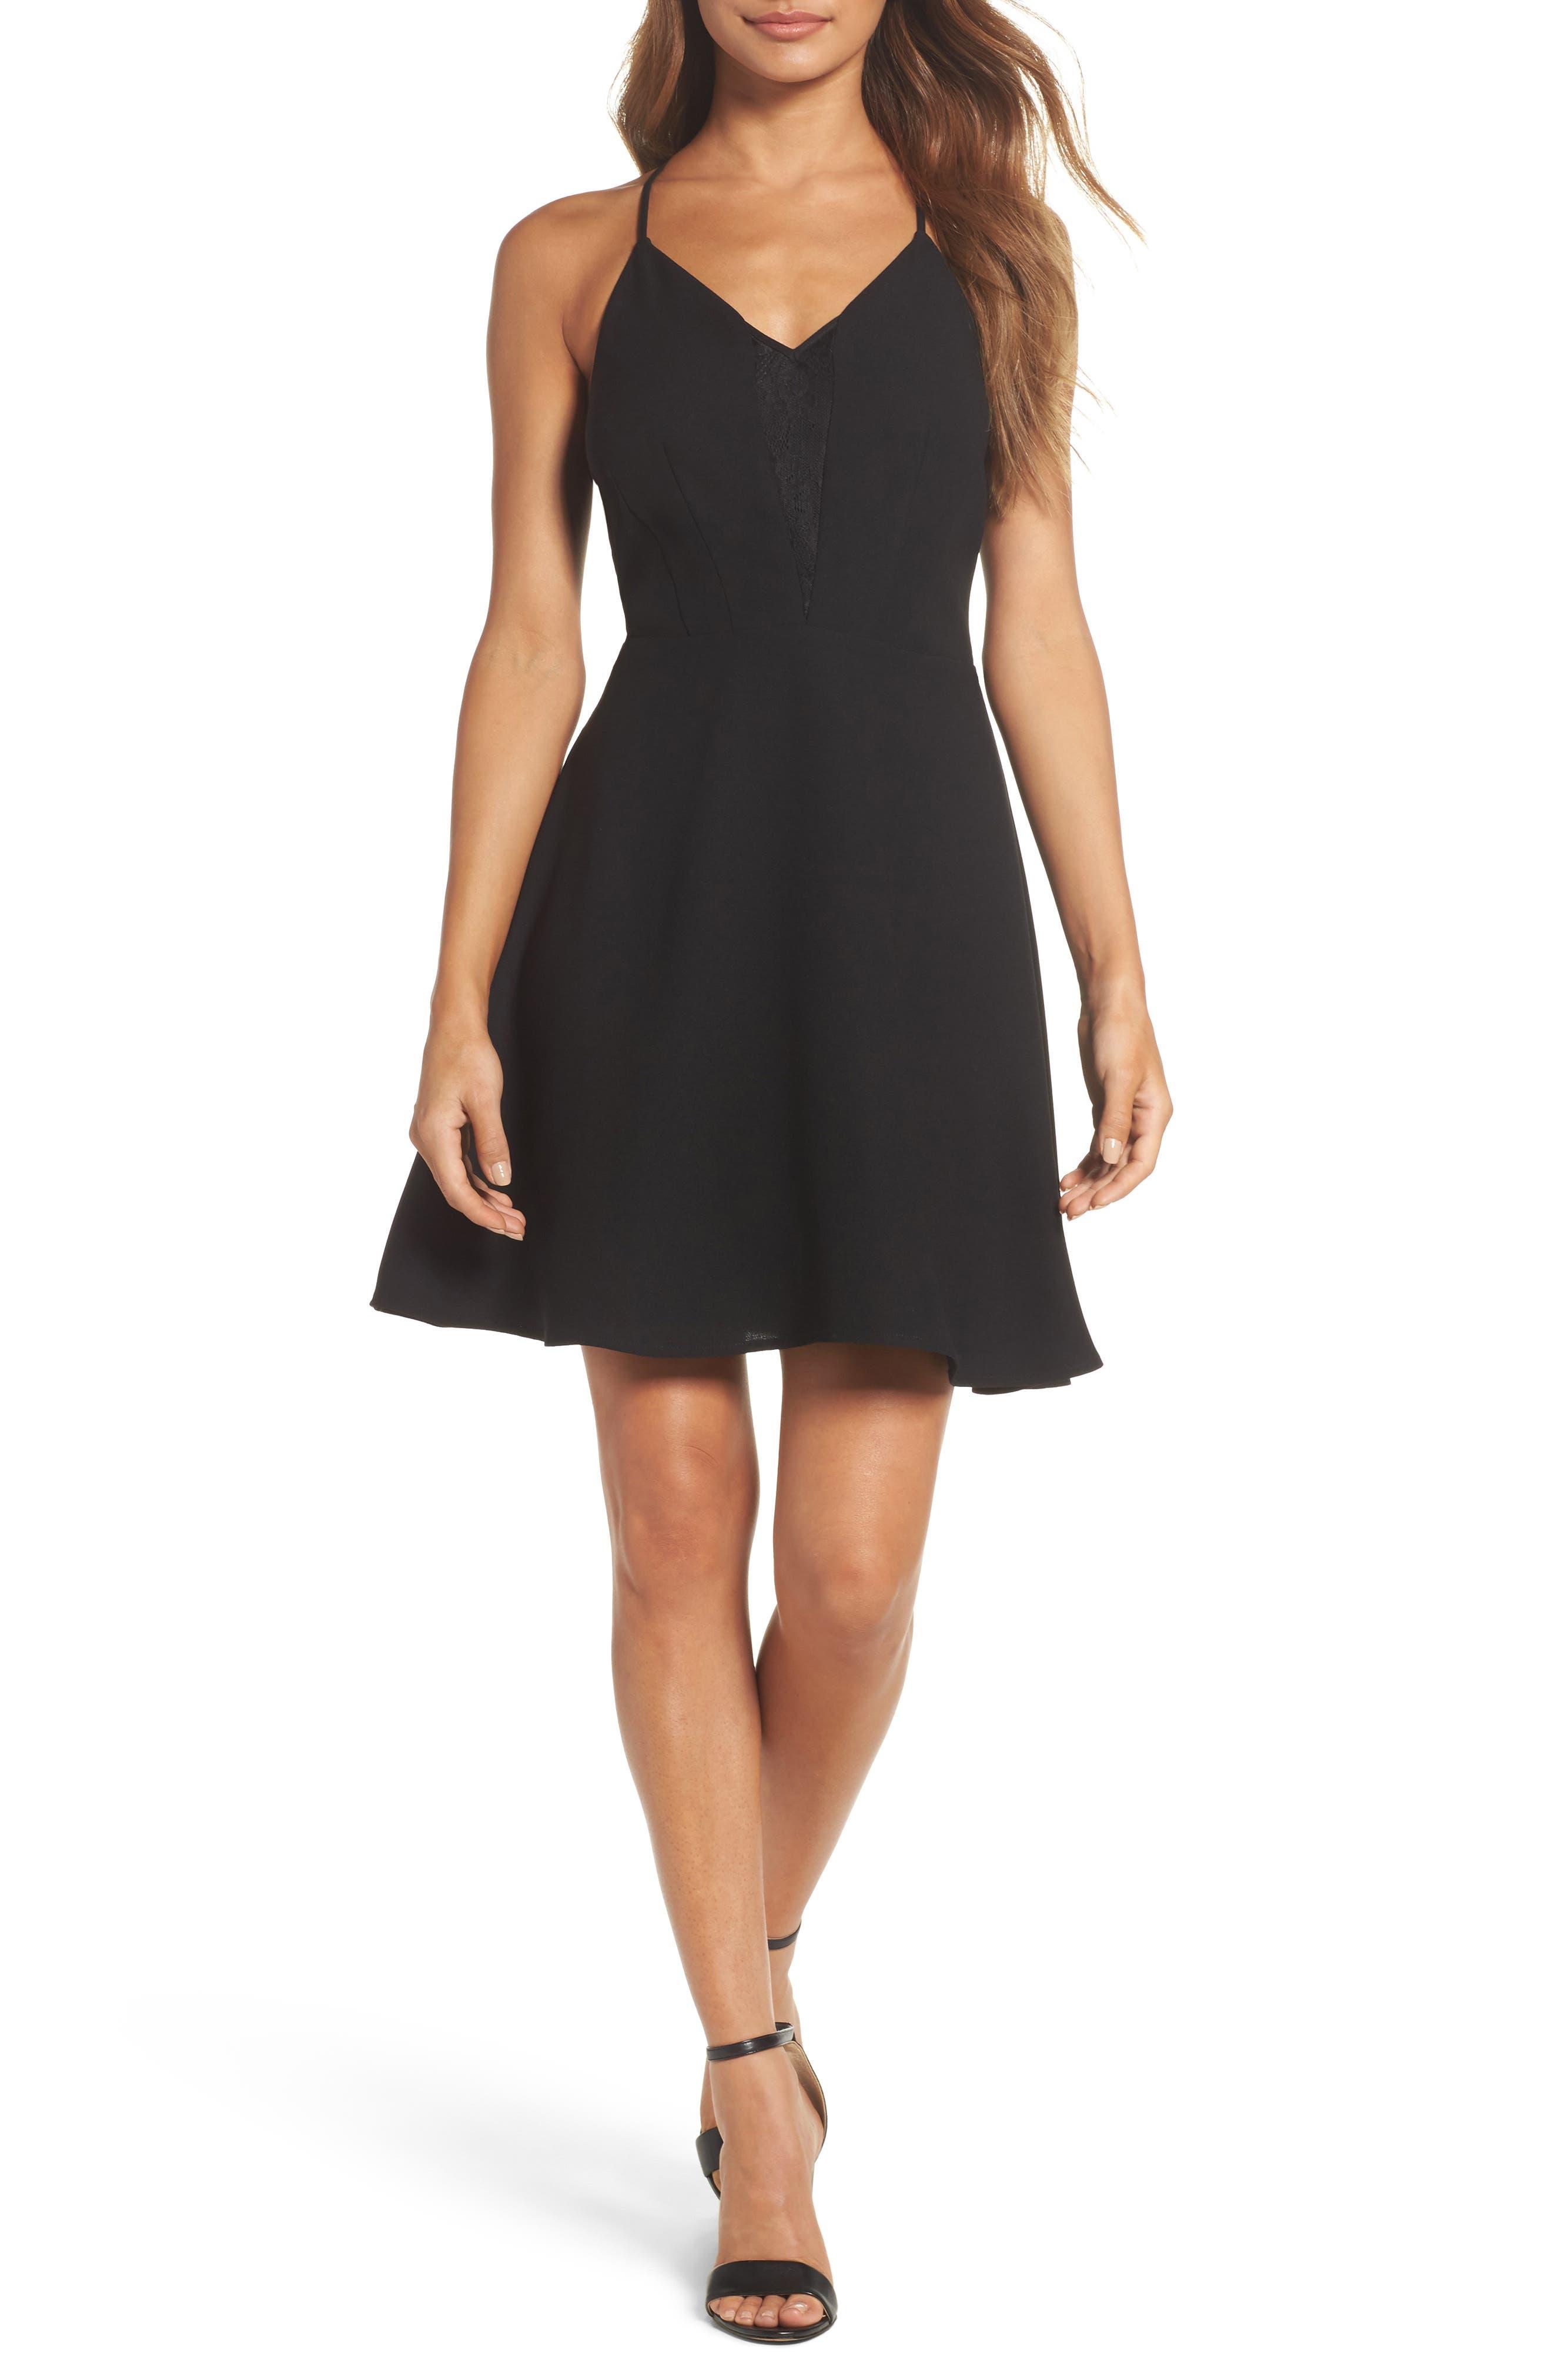 Short Homecoming Dresses Nordstrom 119